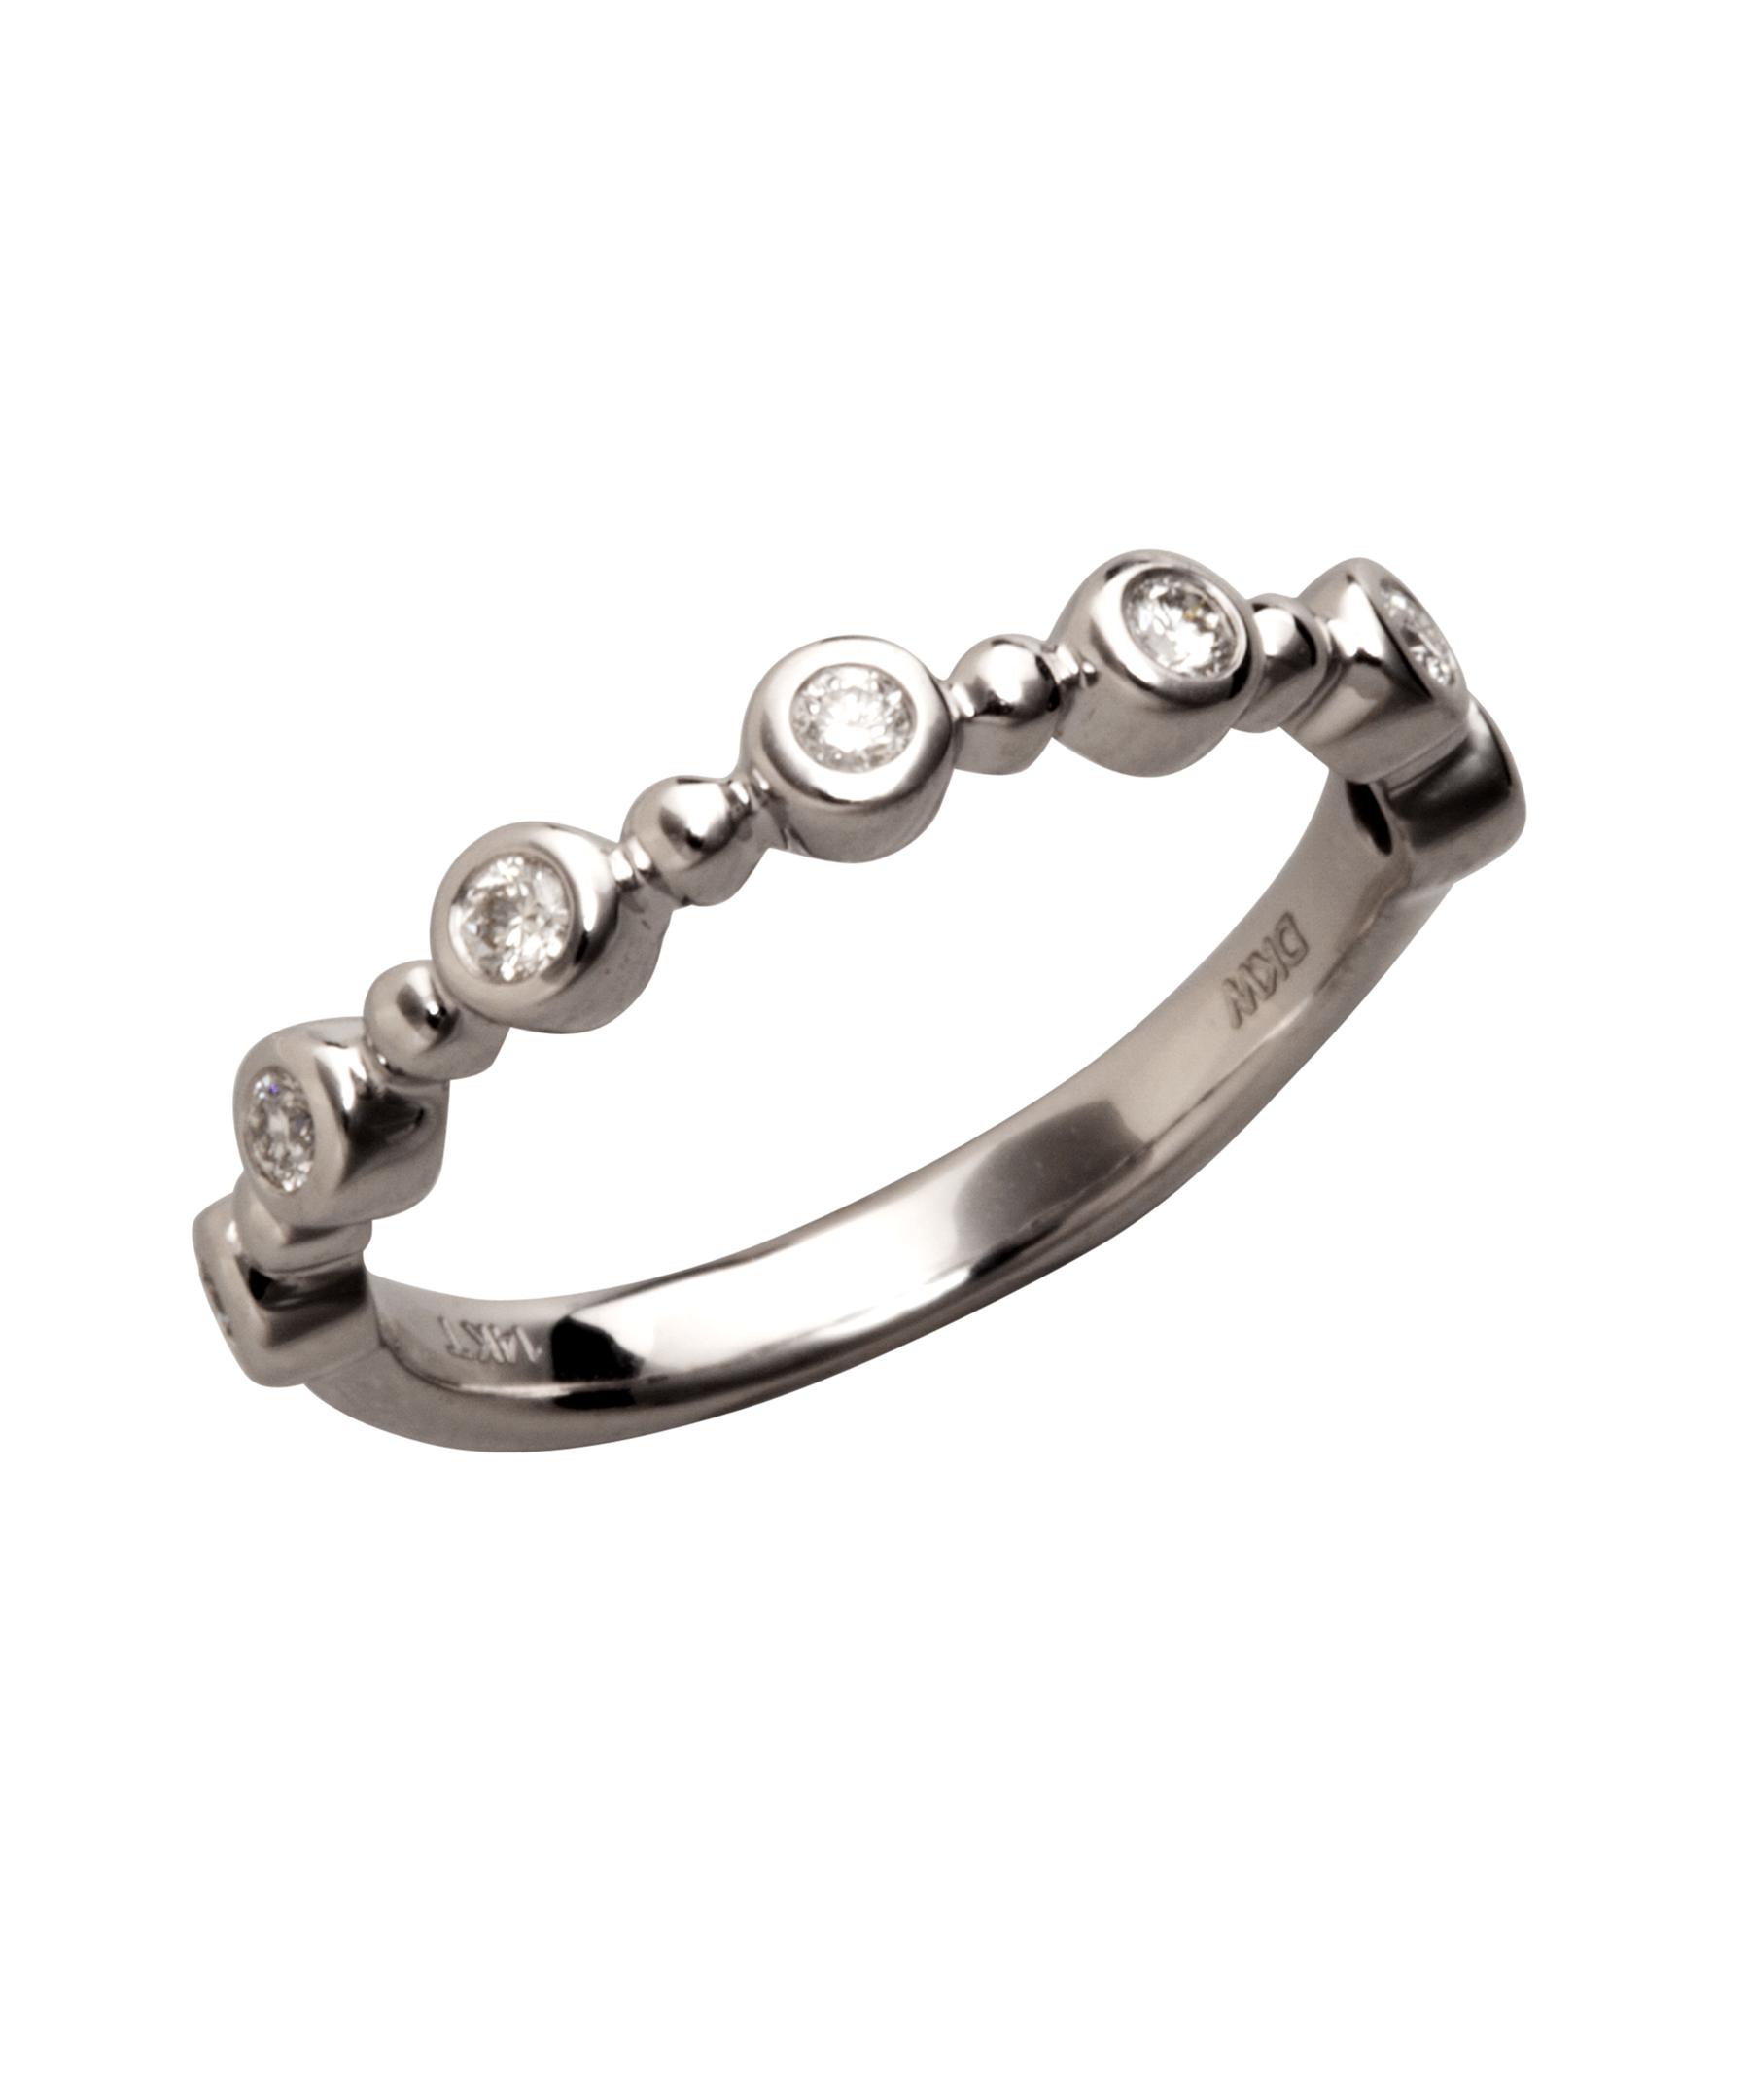 9f8f9210155e Lyst - Colette Nicolai Diamond And White Gold Bezel Ring in Metallic